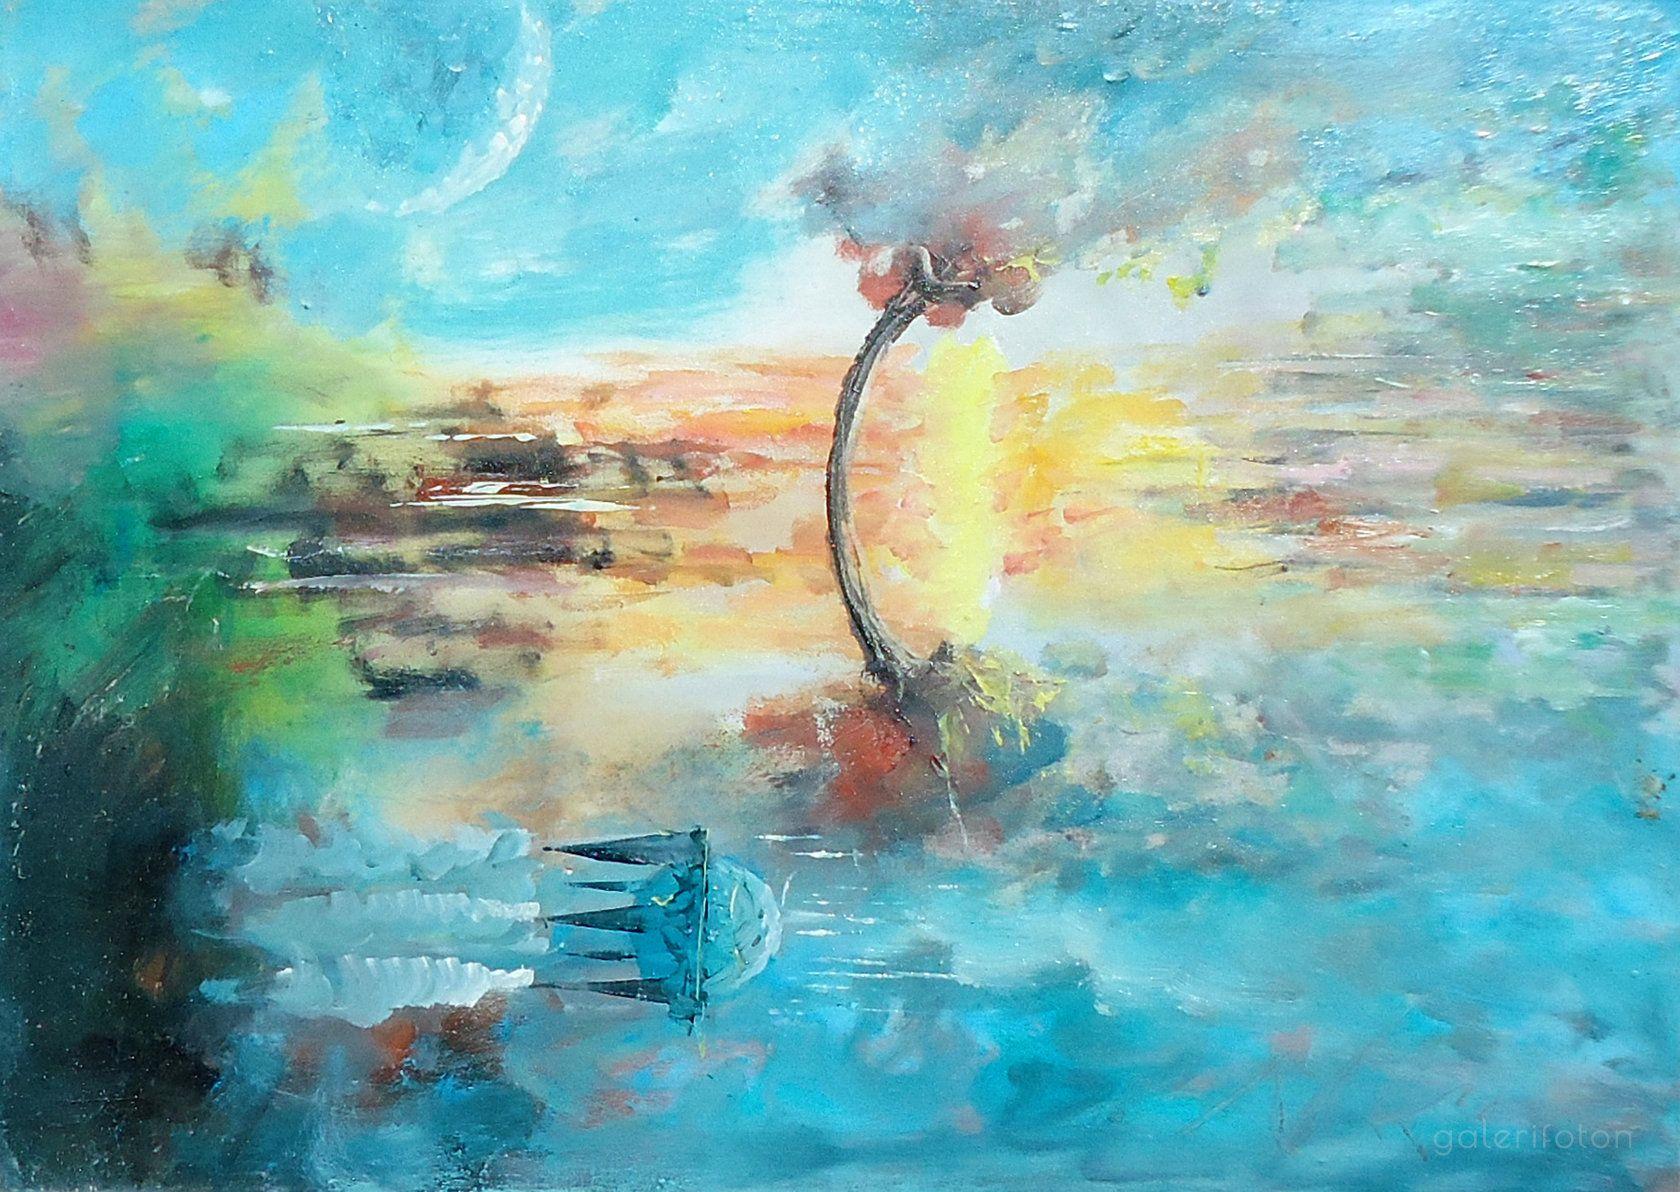 Bluescape Oil On Canvas 13x19